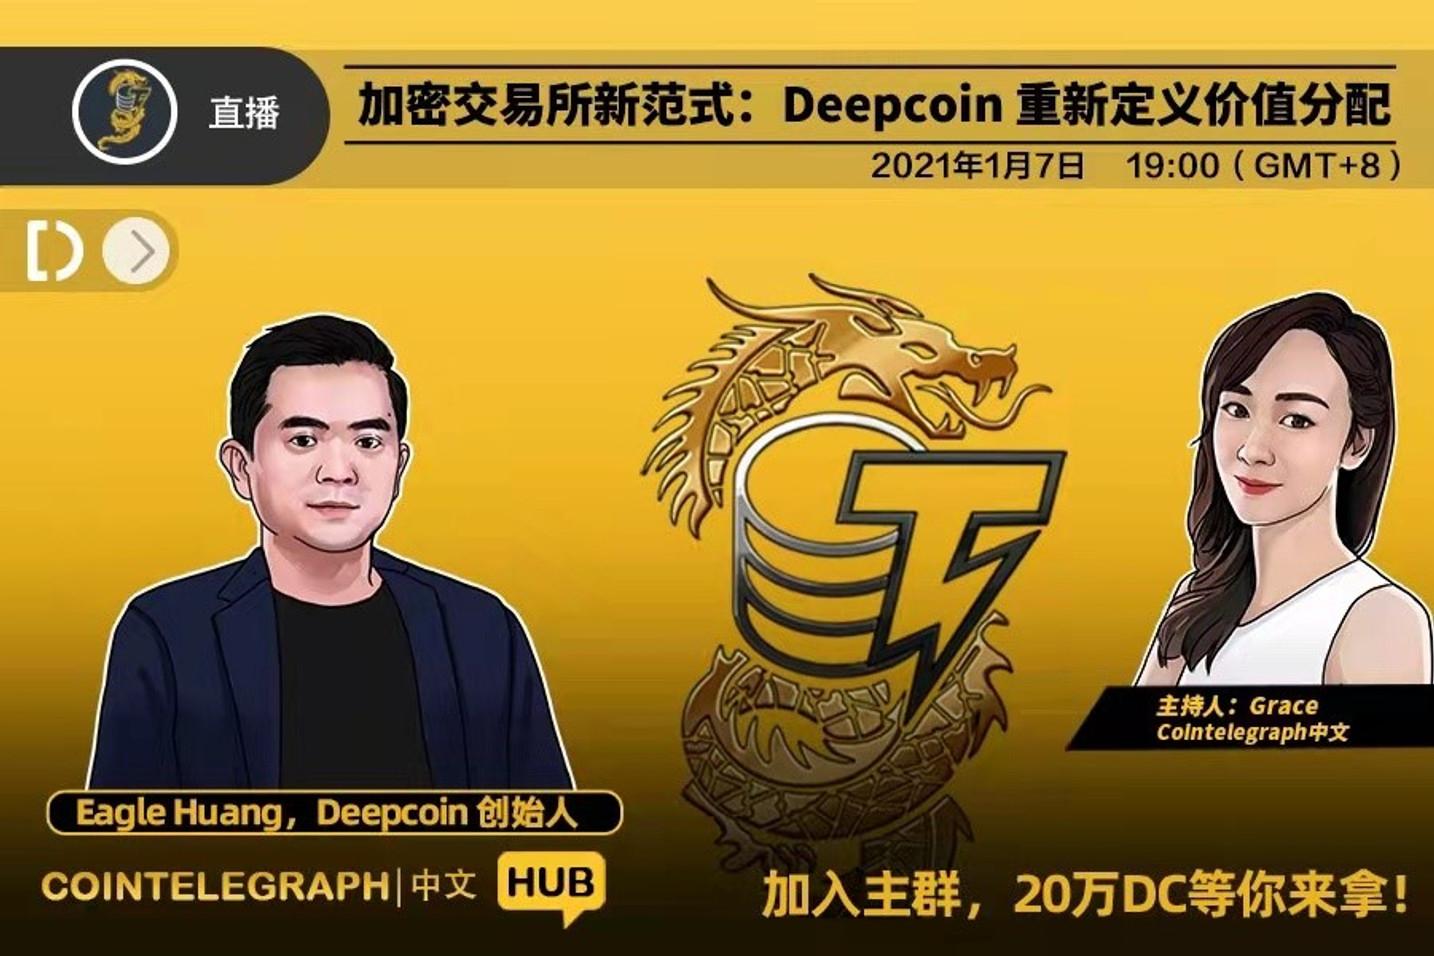 Cointelegraph中文HUB|加密交易所新范式:Deepcoin 重新定义价值分配